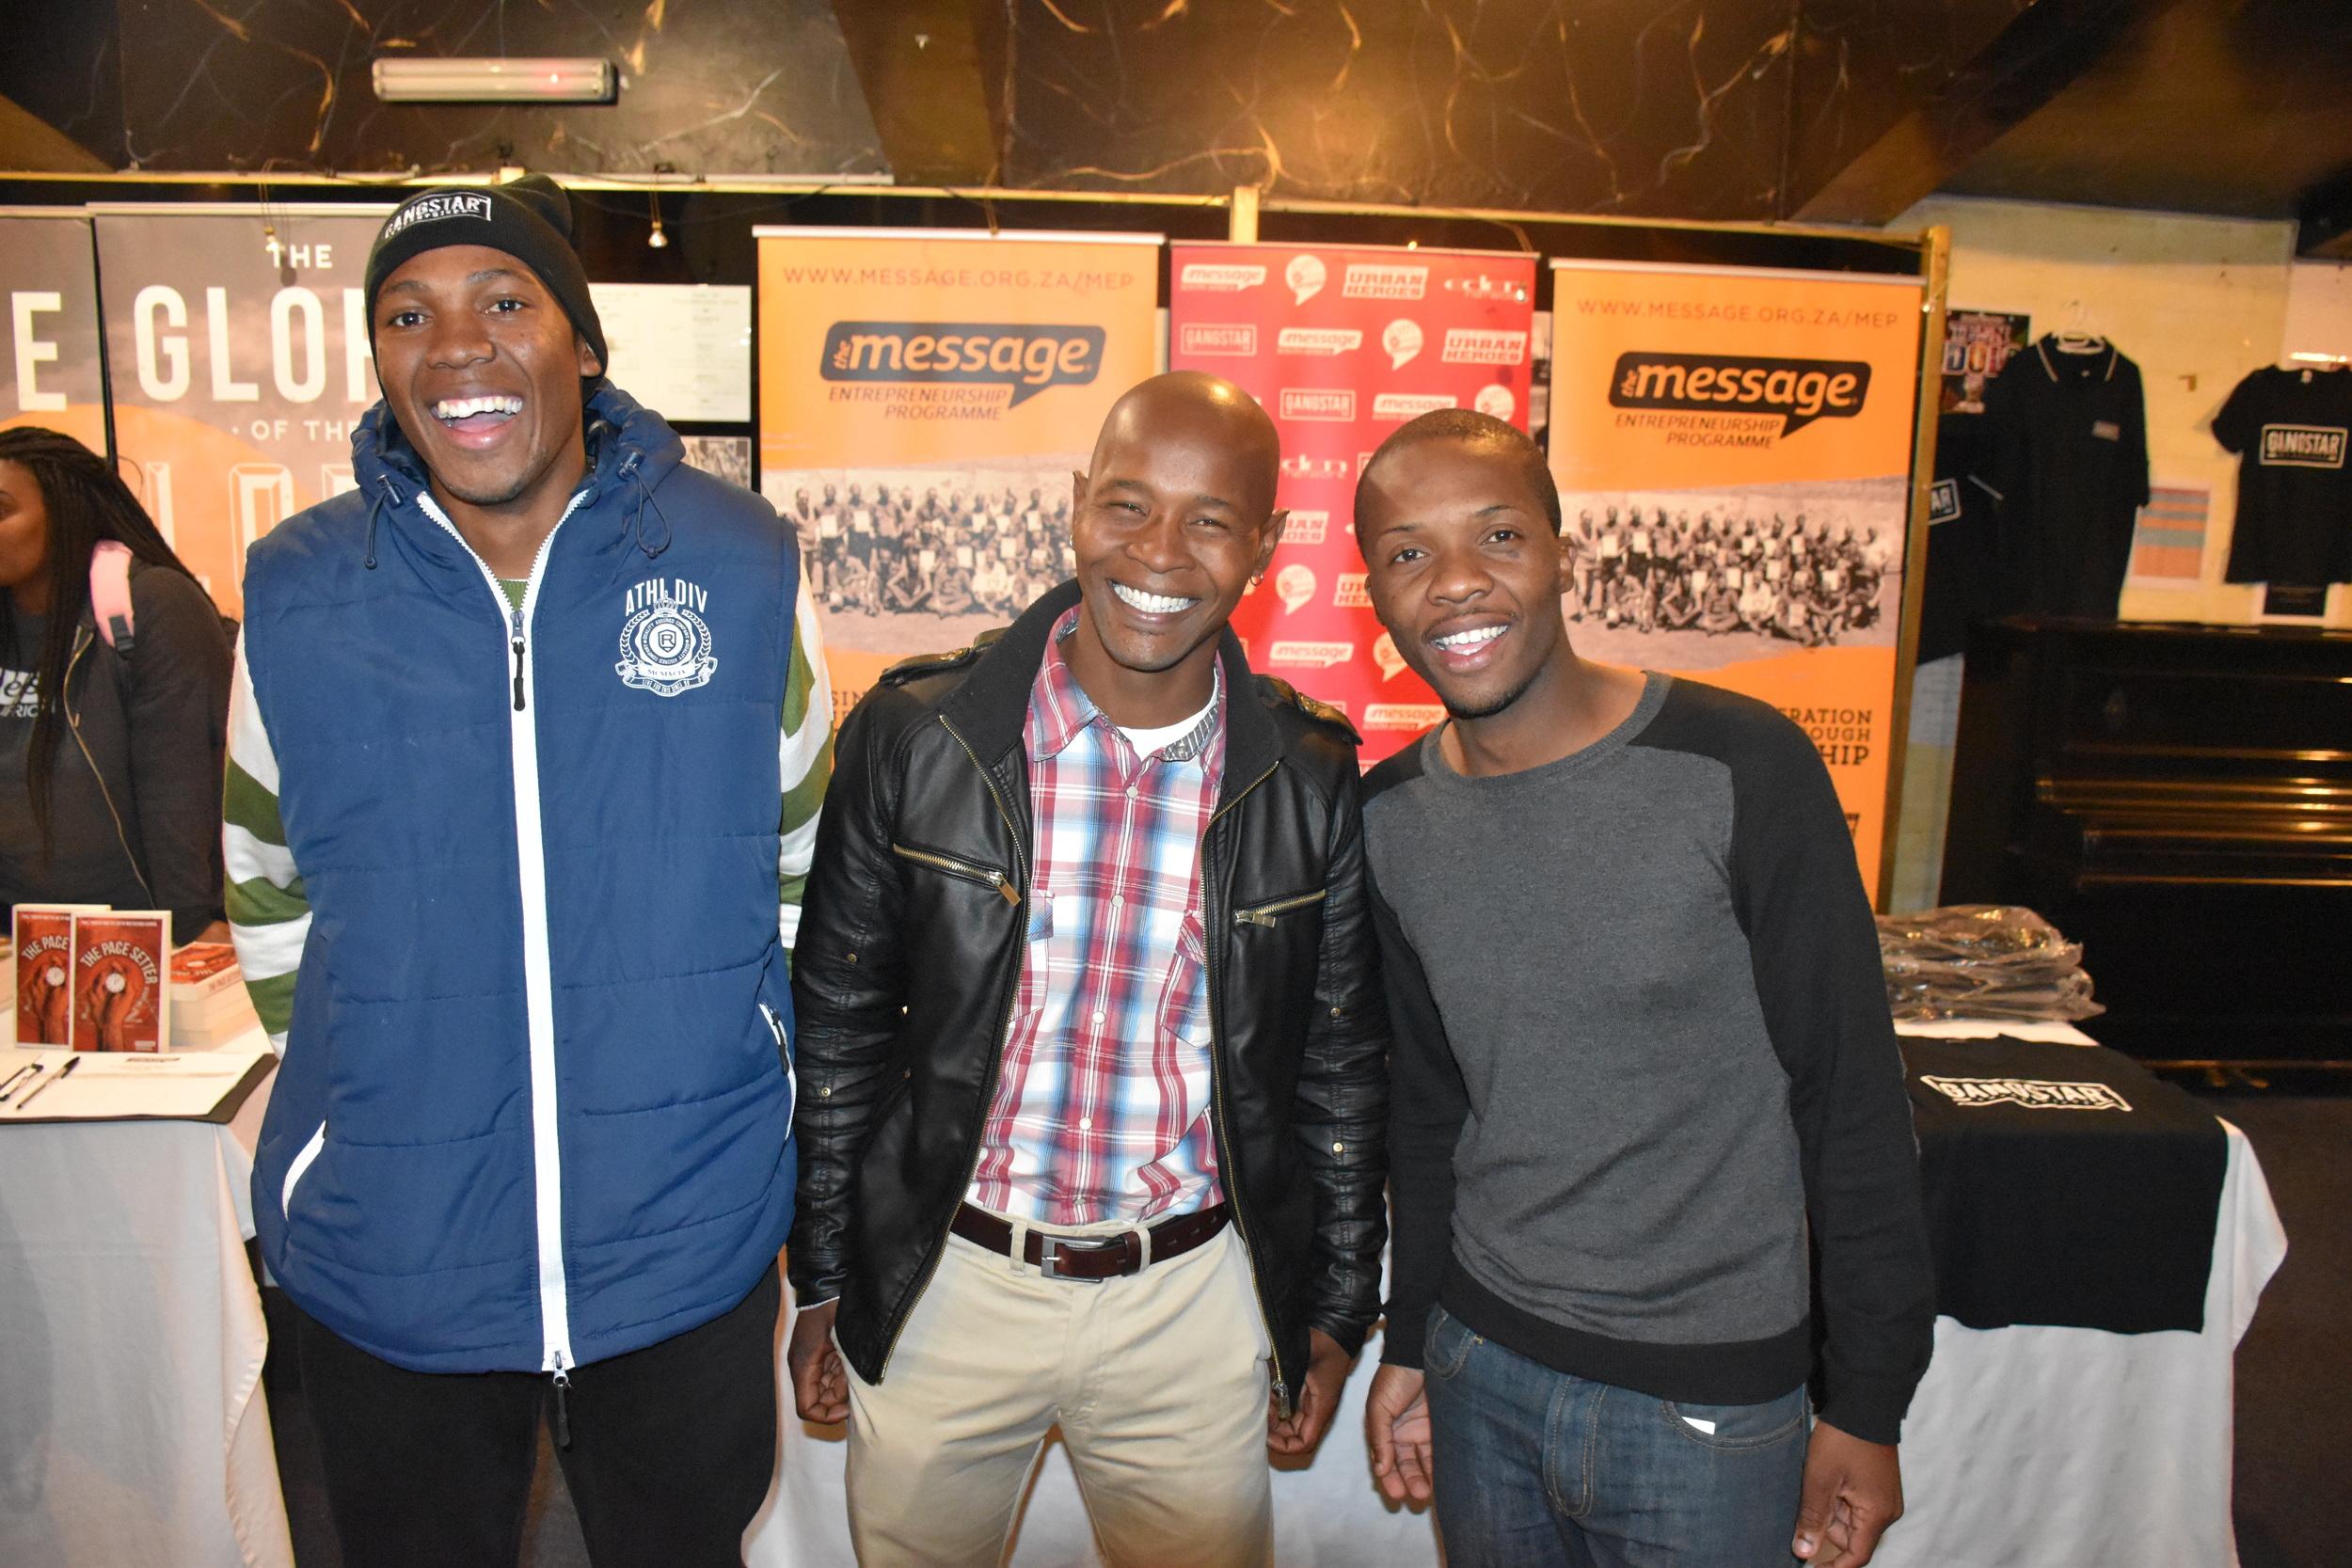 Chumani, Themba and Siviwe enjoying the night!